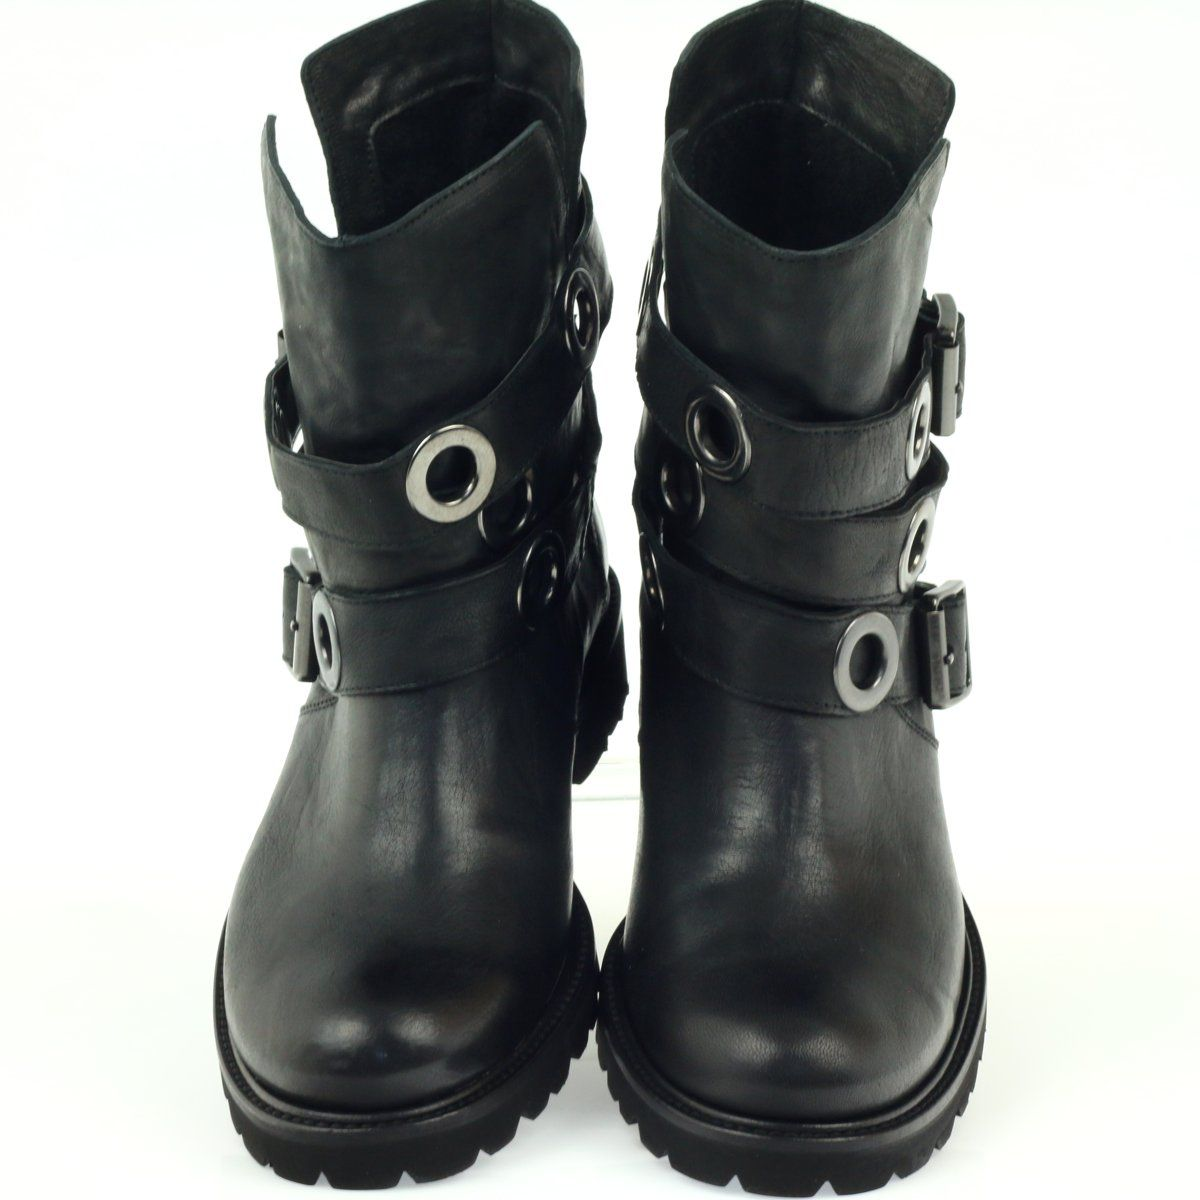 Botki Paski Zdobione Kolkami Badura Czarne Boots Biker Boot Shoes